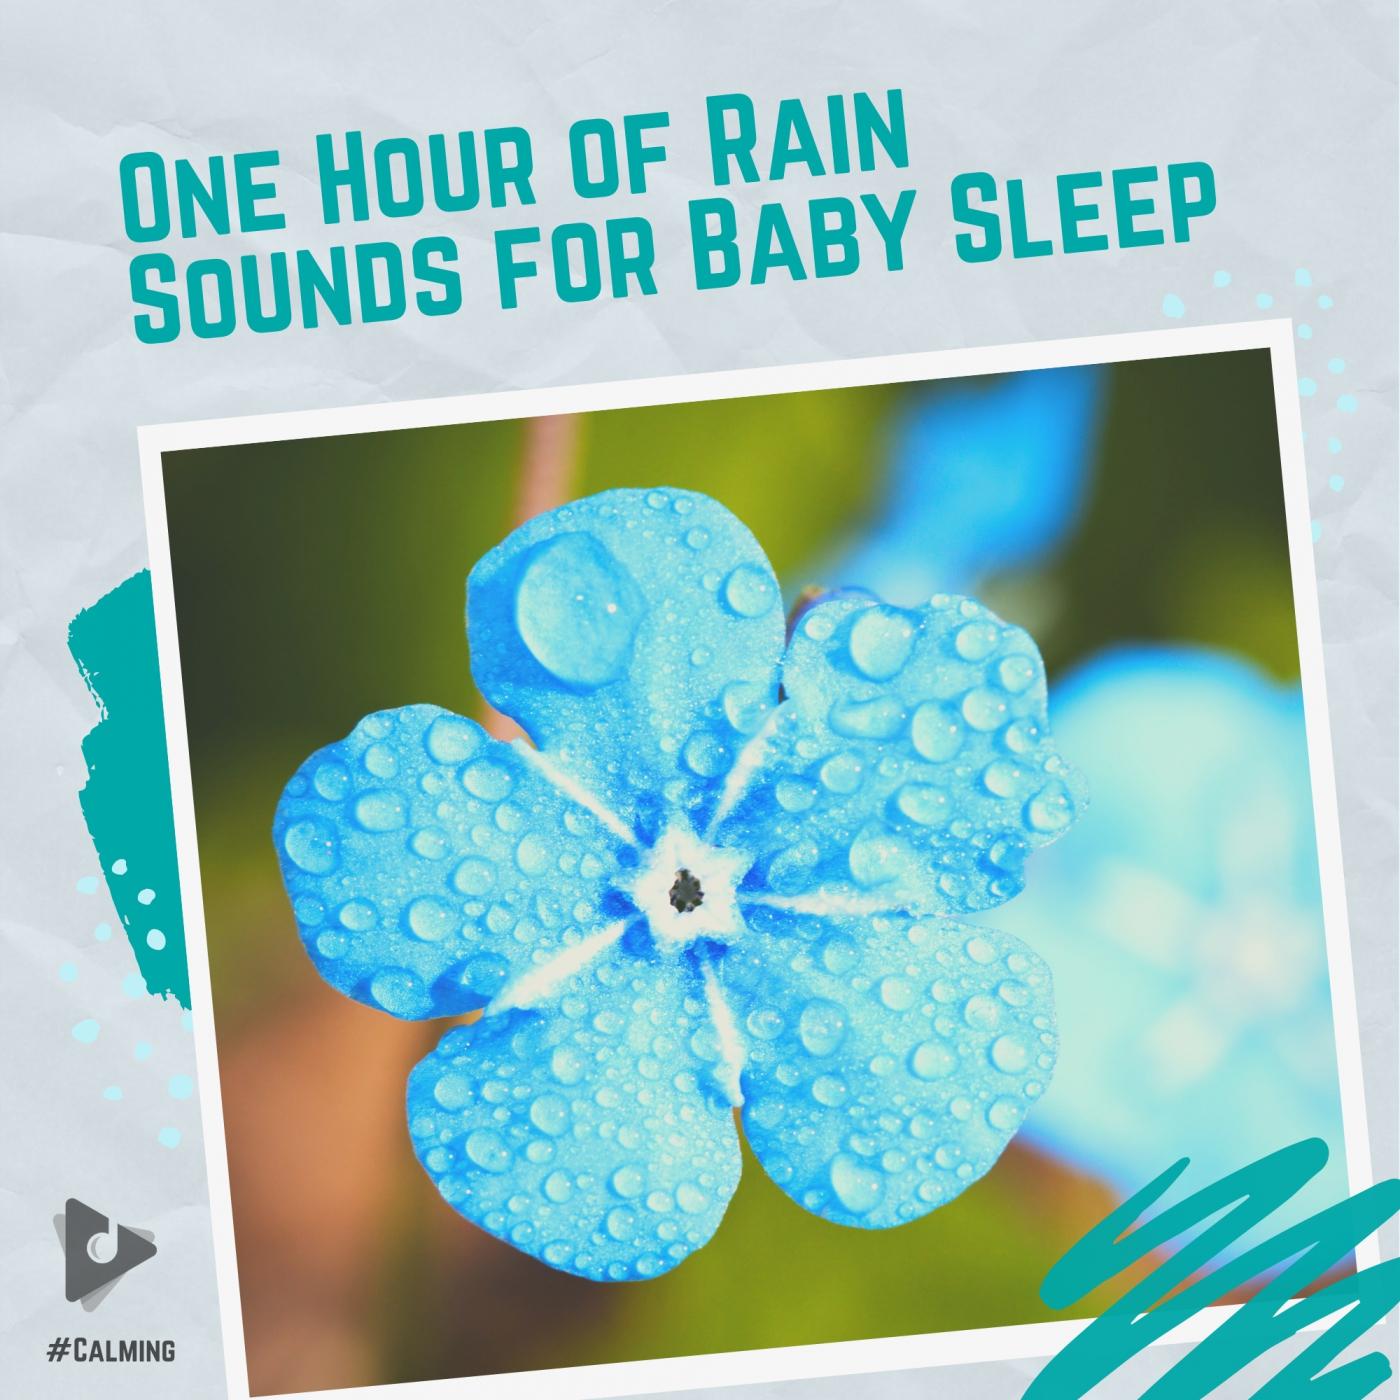 One Hour of Rain Sounds for Baby Sleep